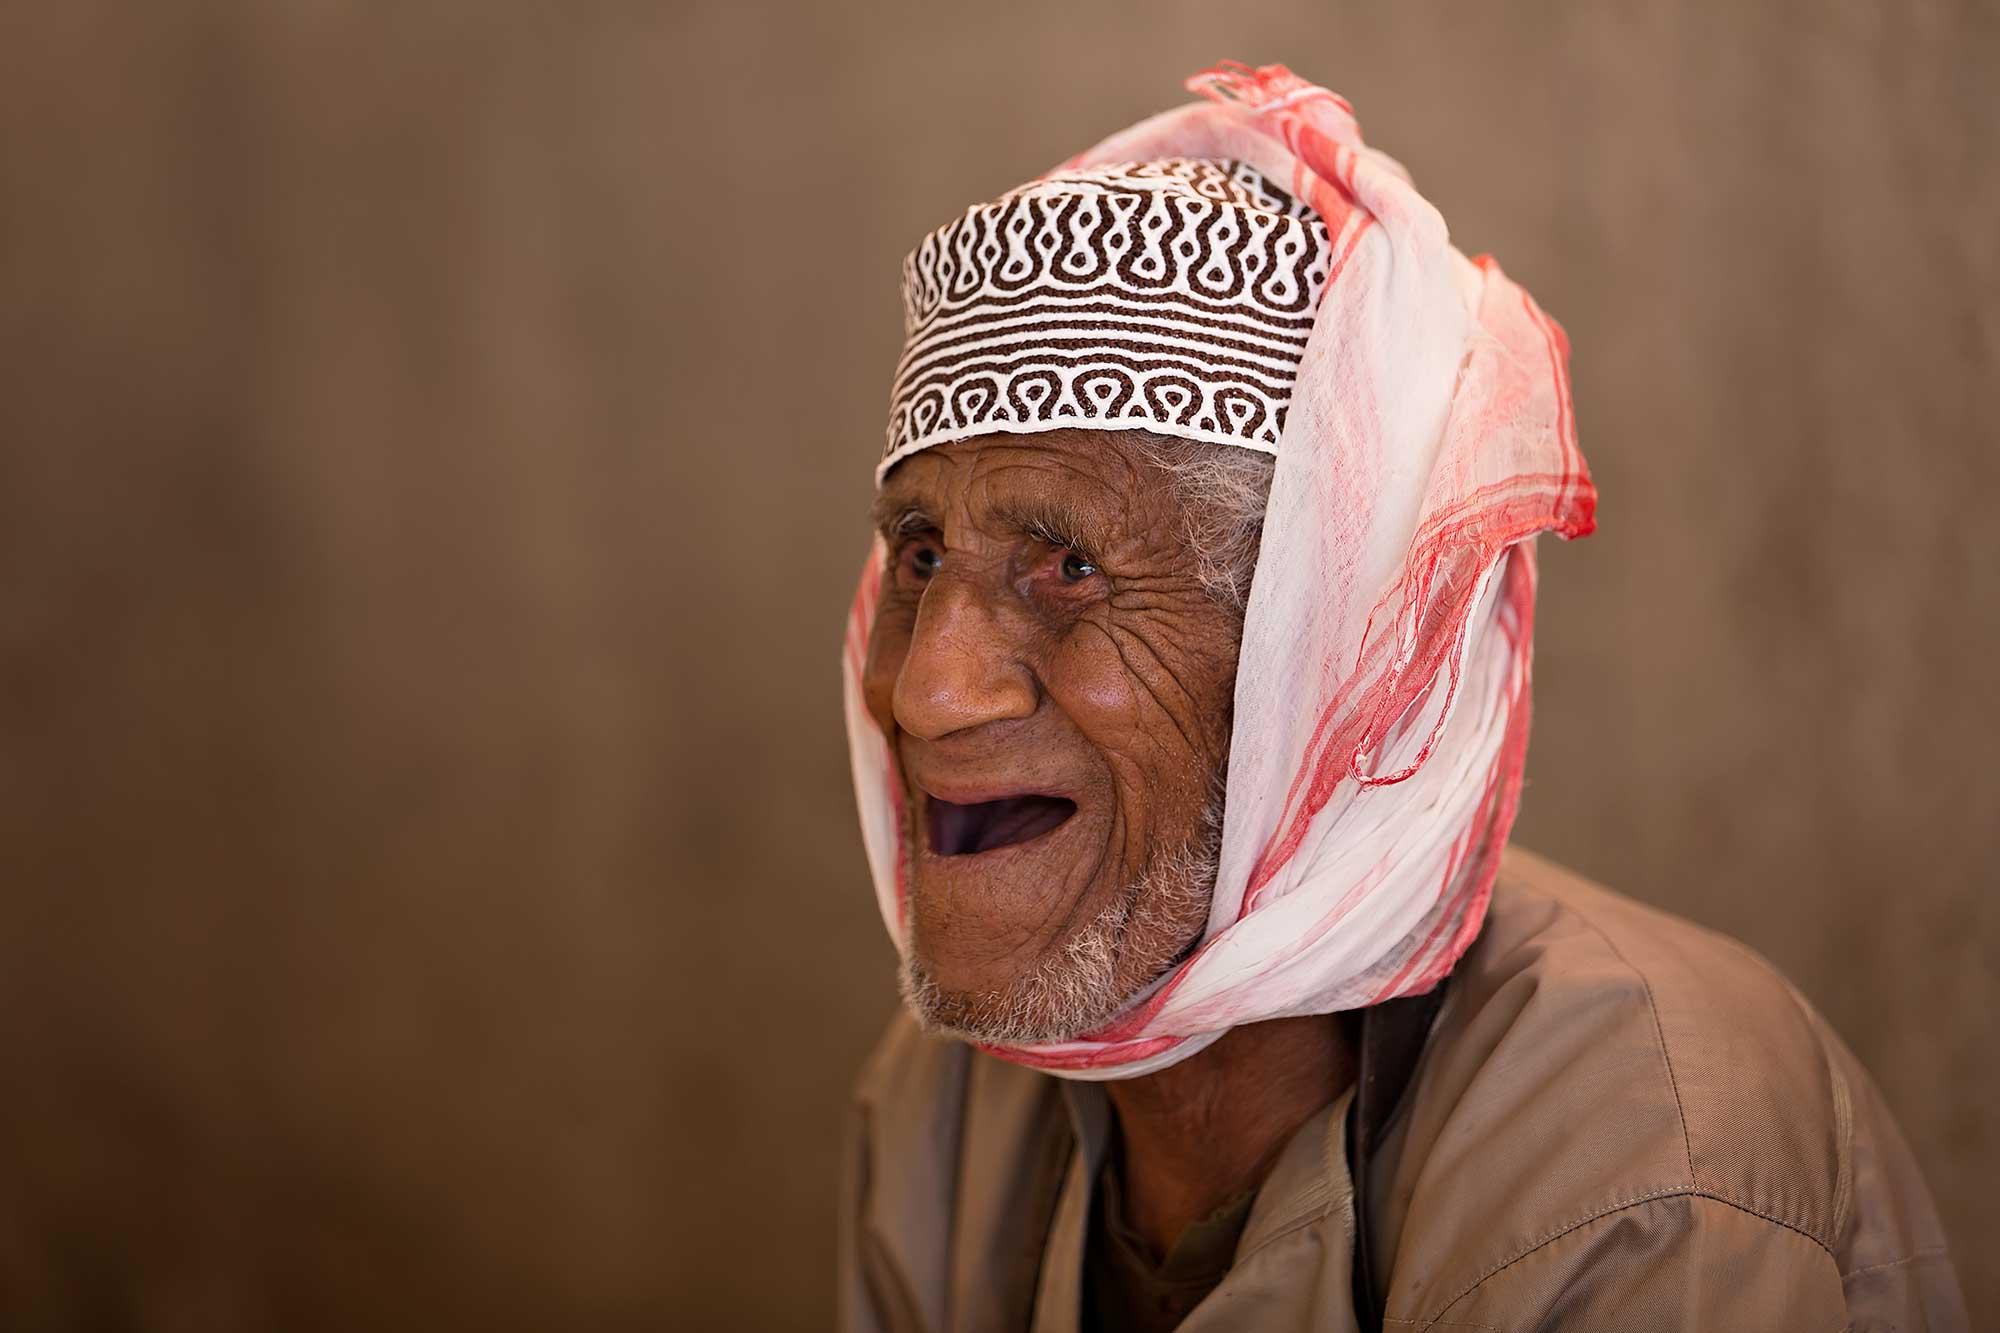 Portrait of a market man in Muscat. © Ulli Maier & Nisa Maier